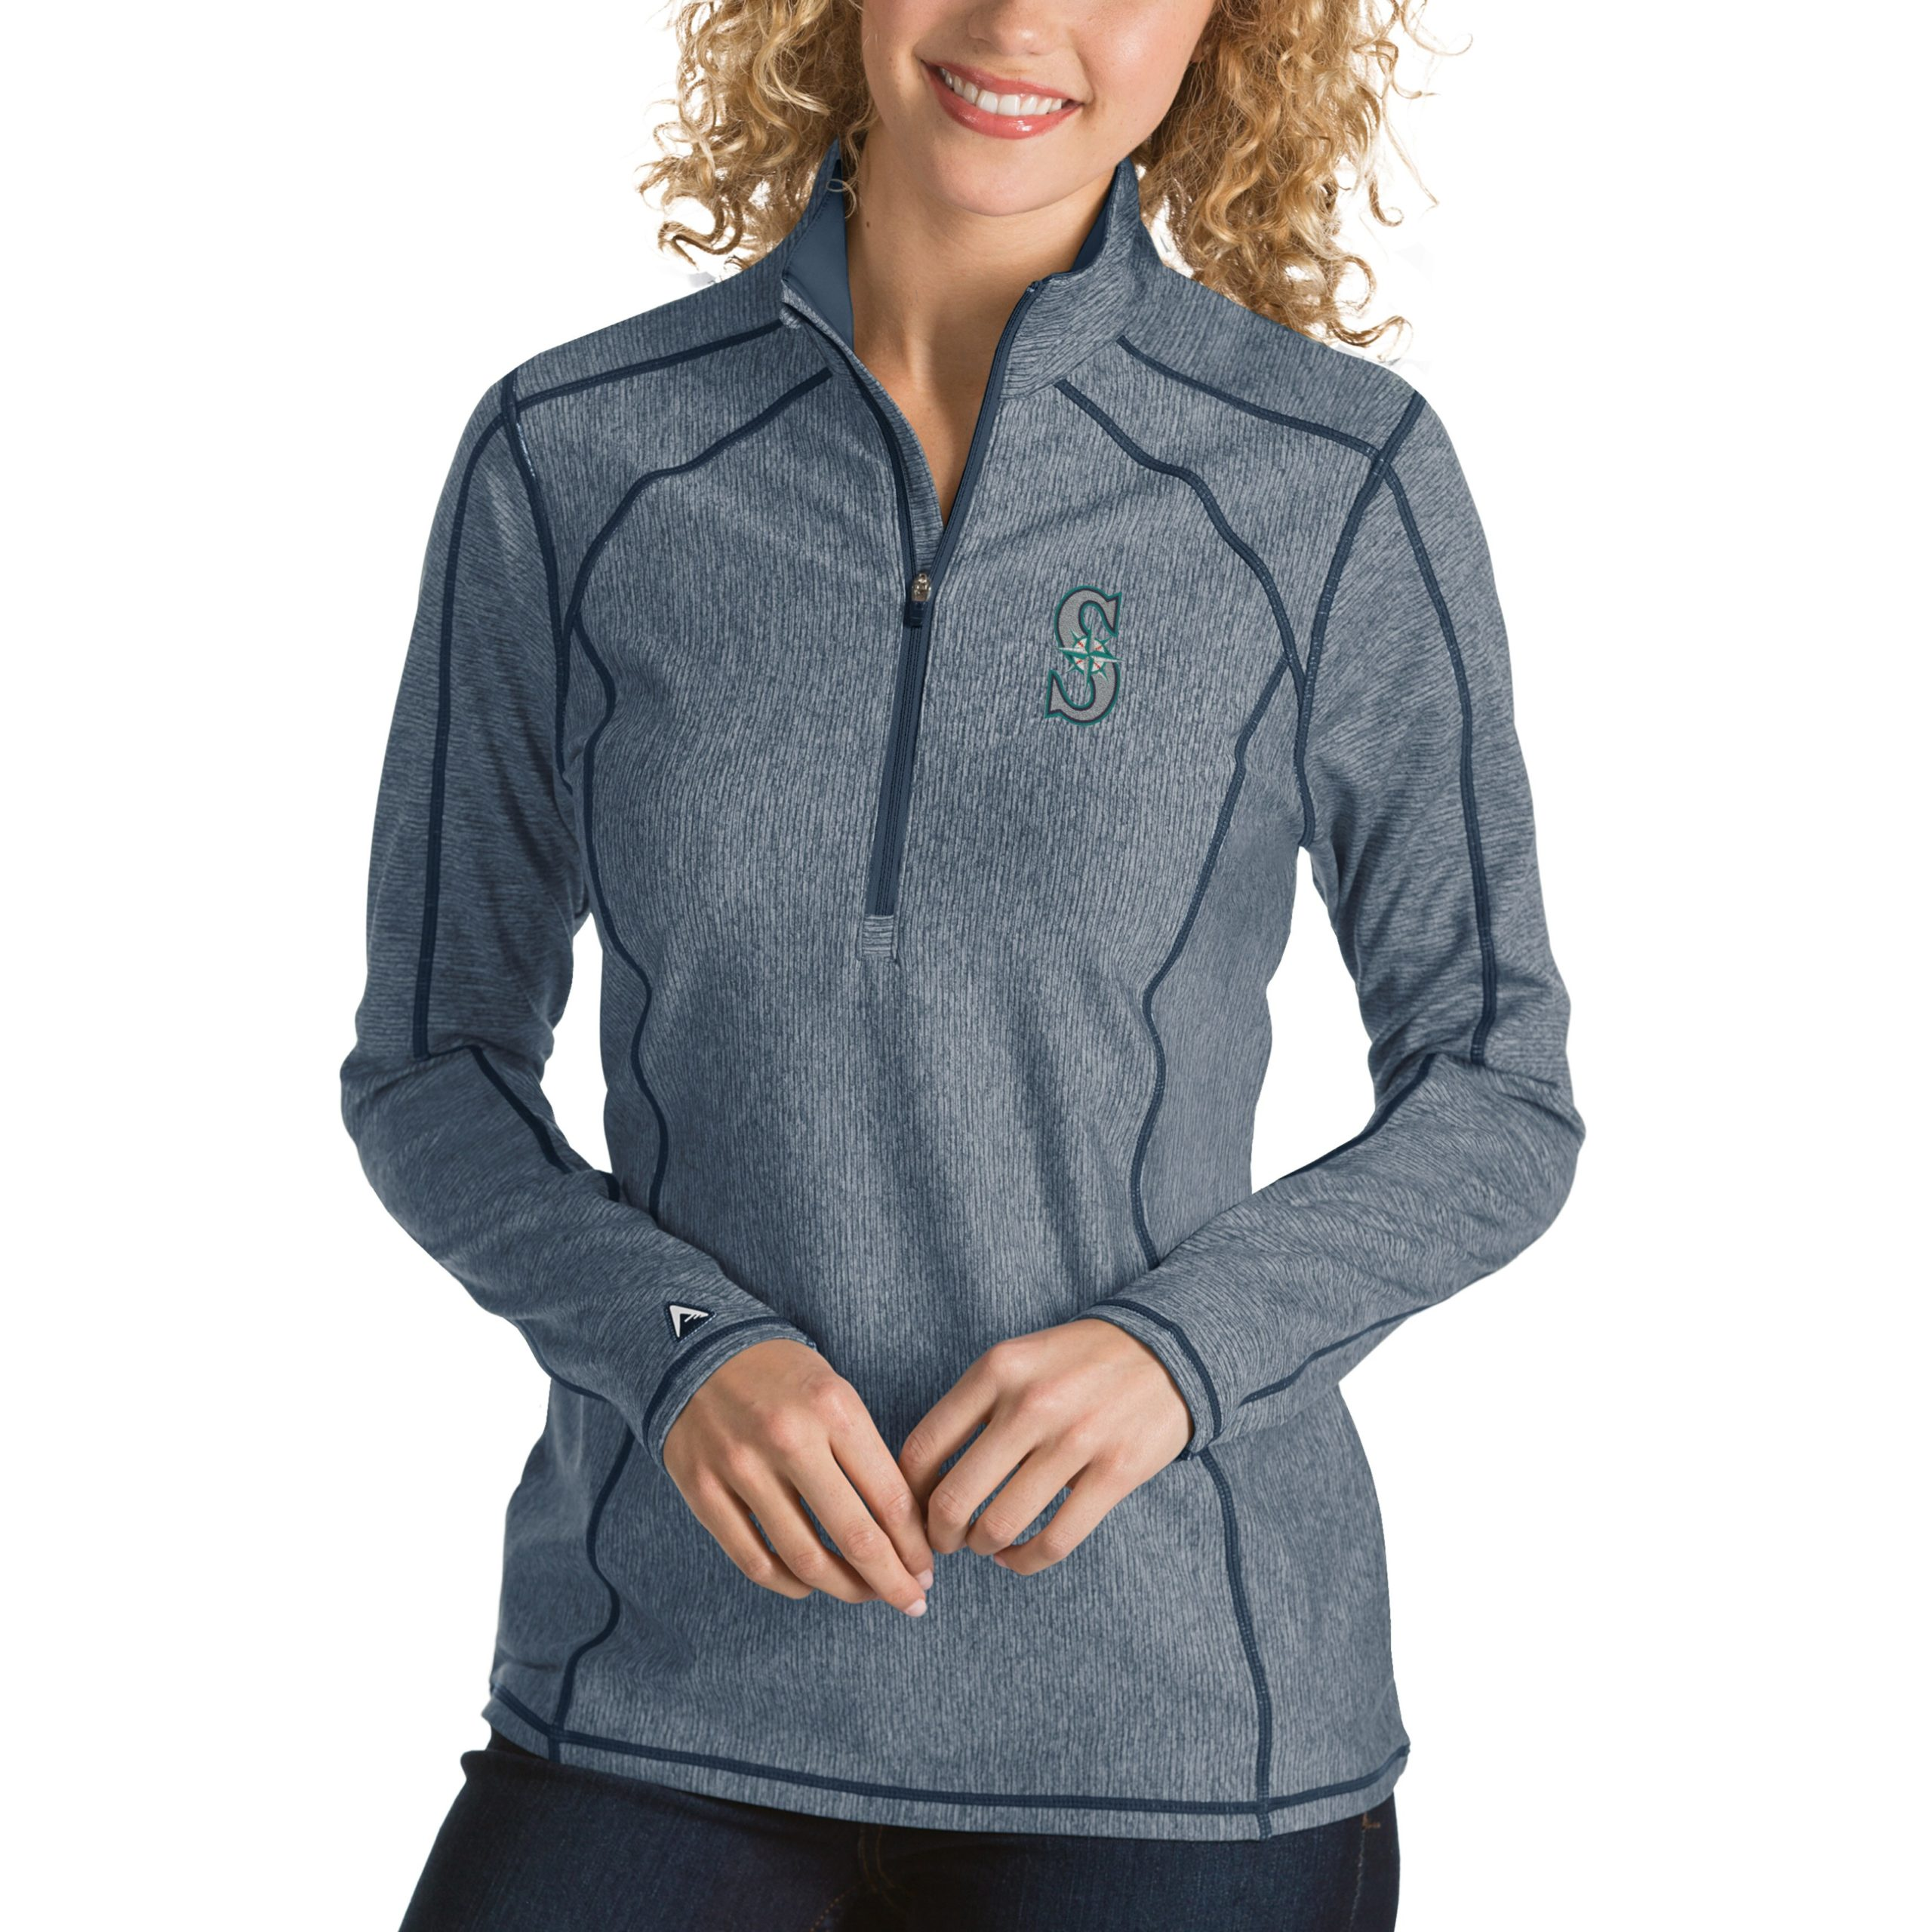 Seattle Mariners Antigua Women's Tempo Desert Dry 1/4-Zip Pullover Jacket - Heathered Navy